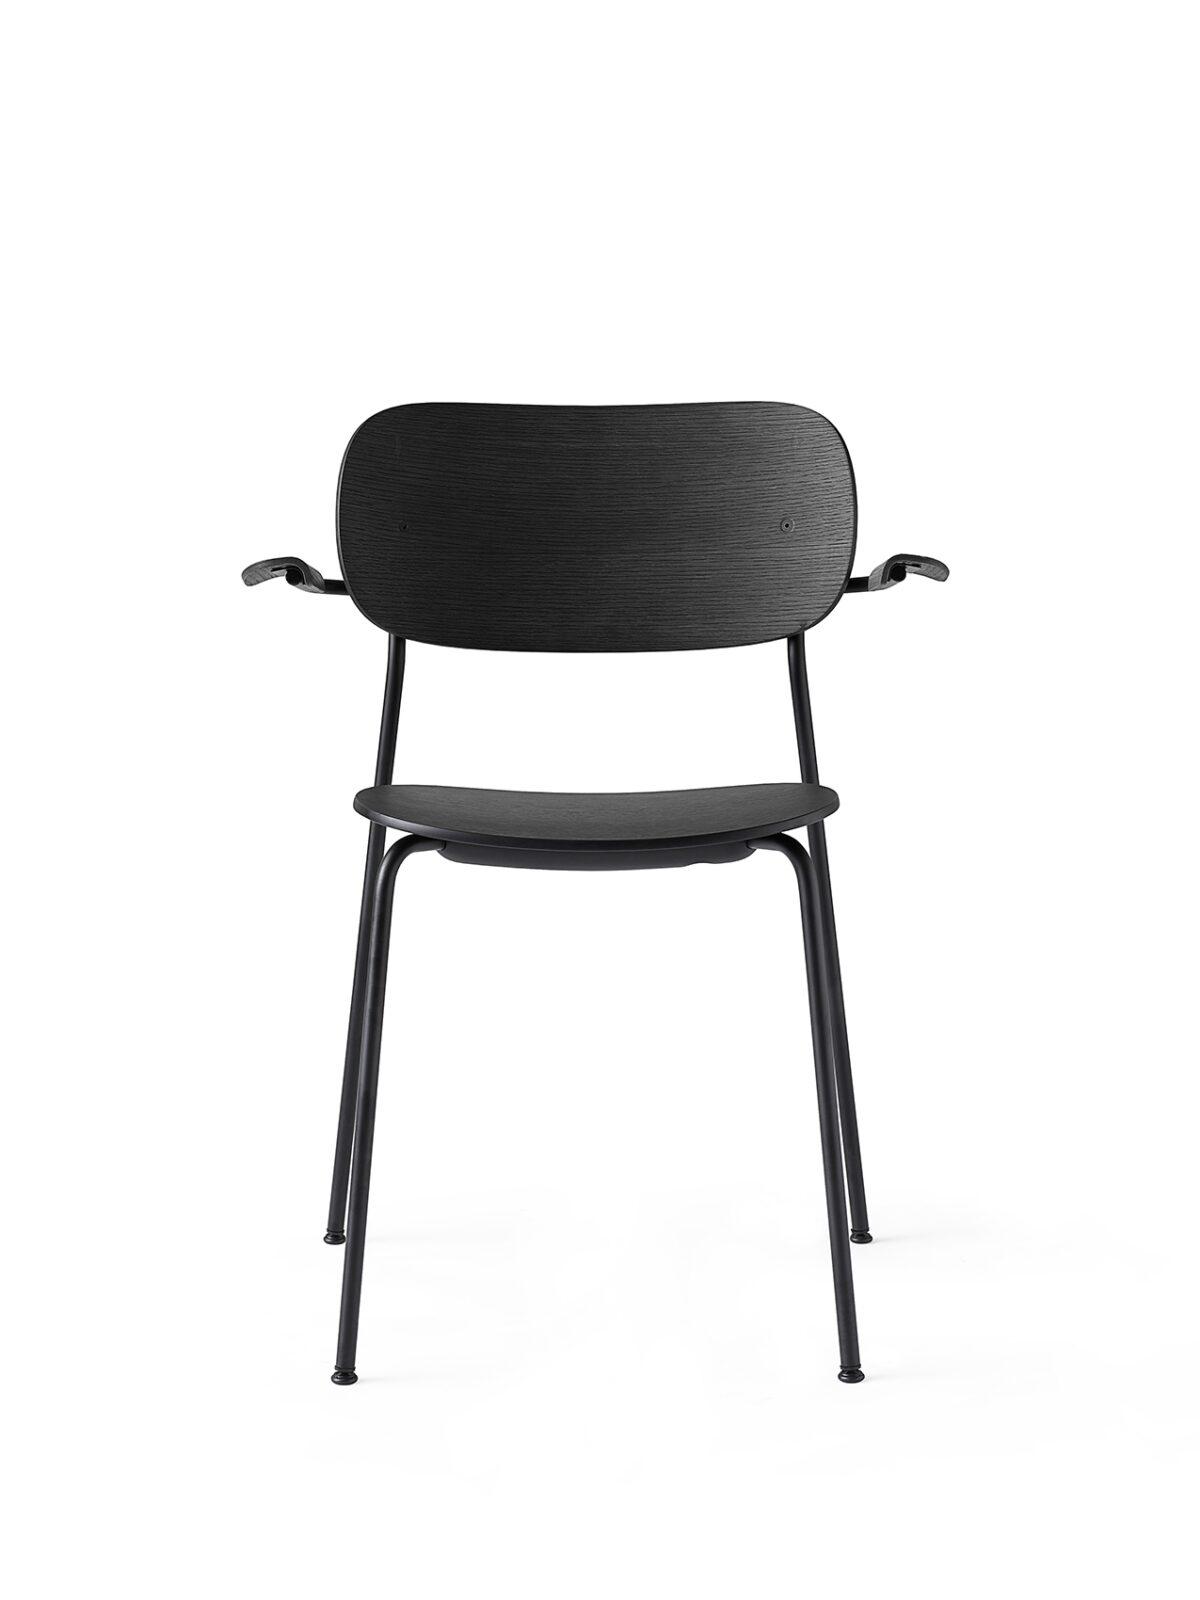 1166539 Co Chair Black Base Black Oak w Armrest 4